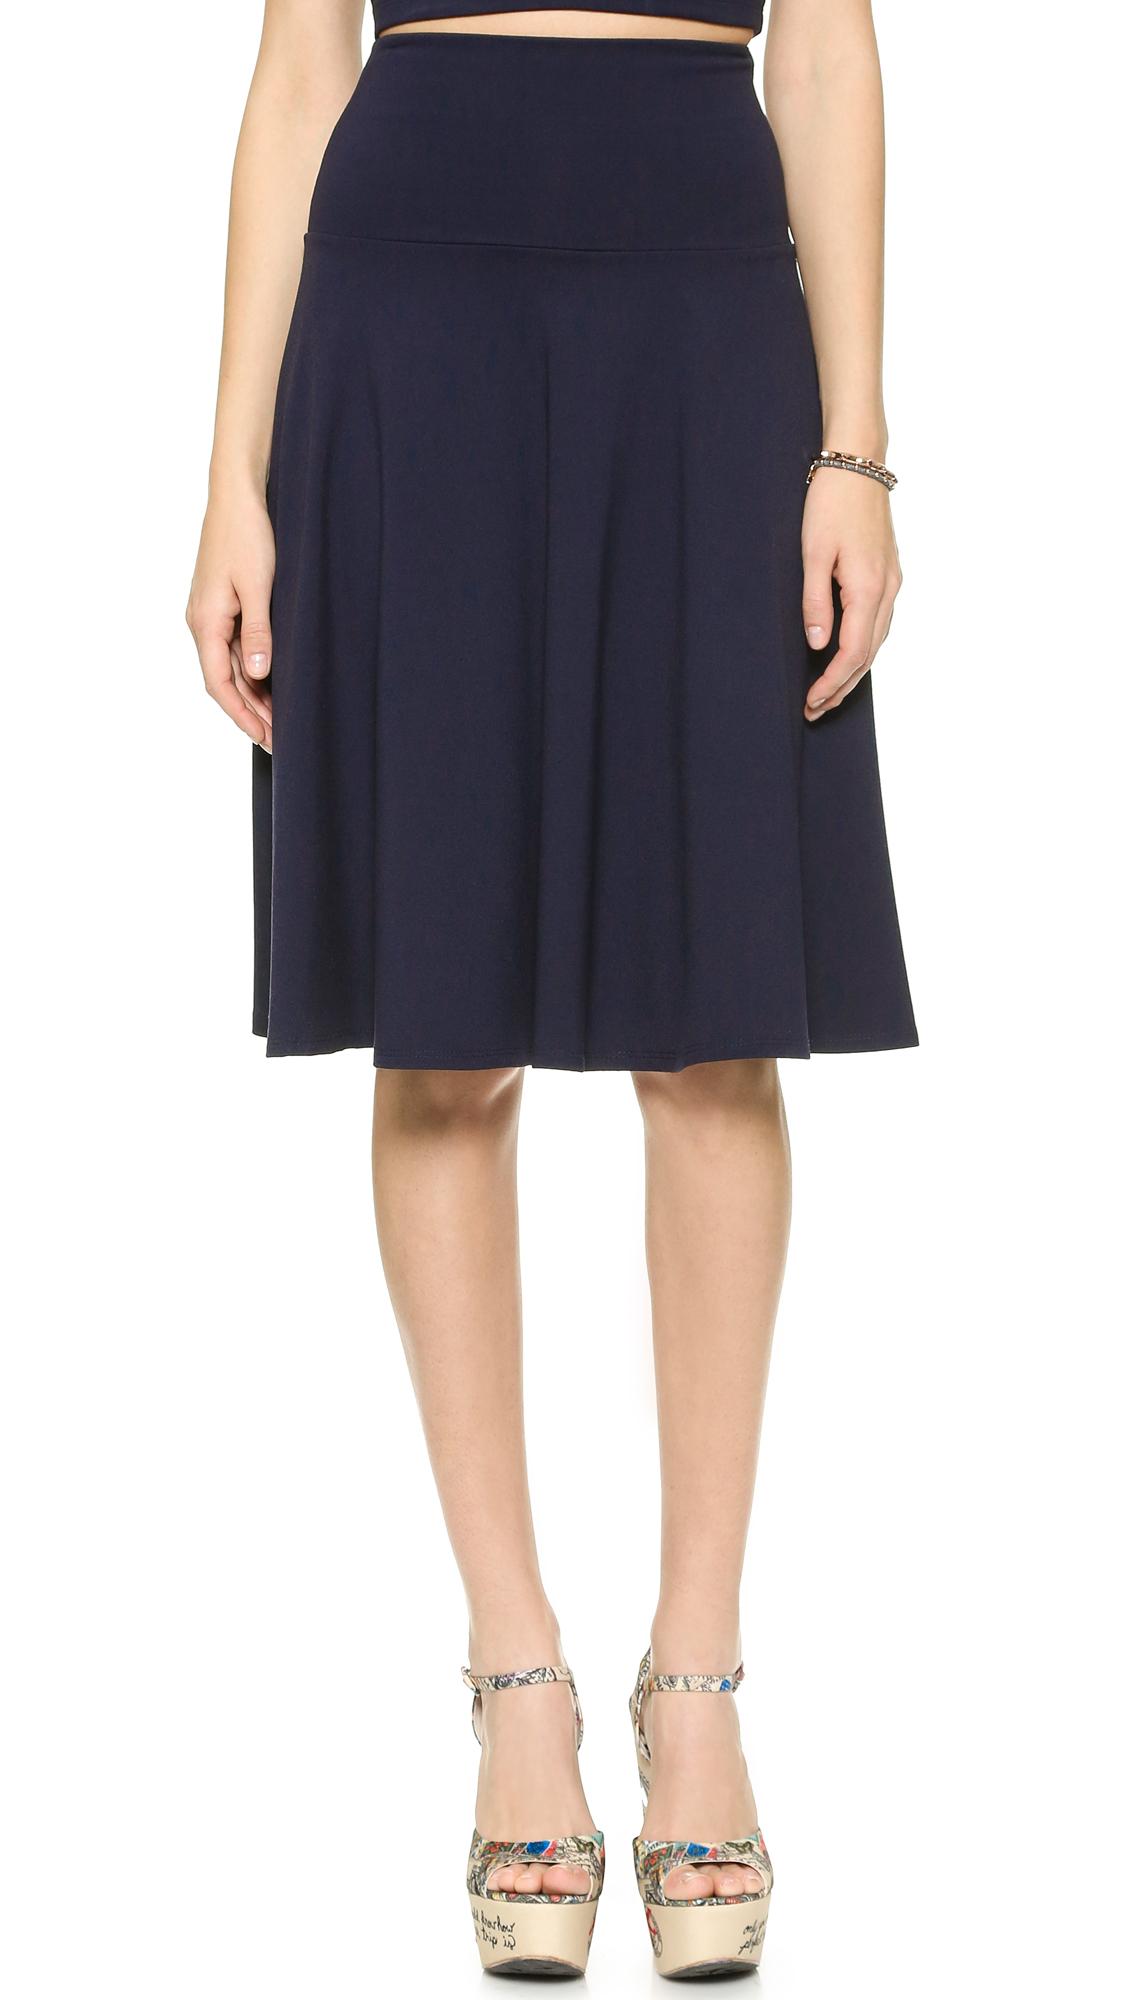 Susana Monaco High Waisted Tea Skirt - Midnight